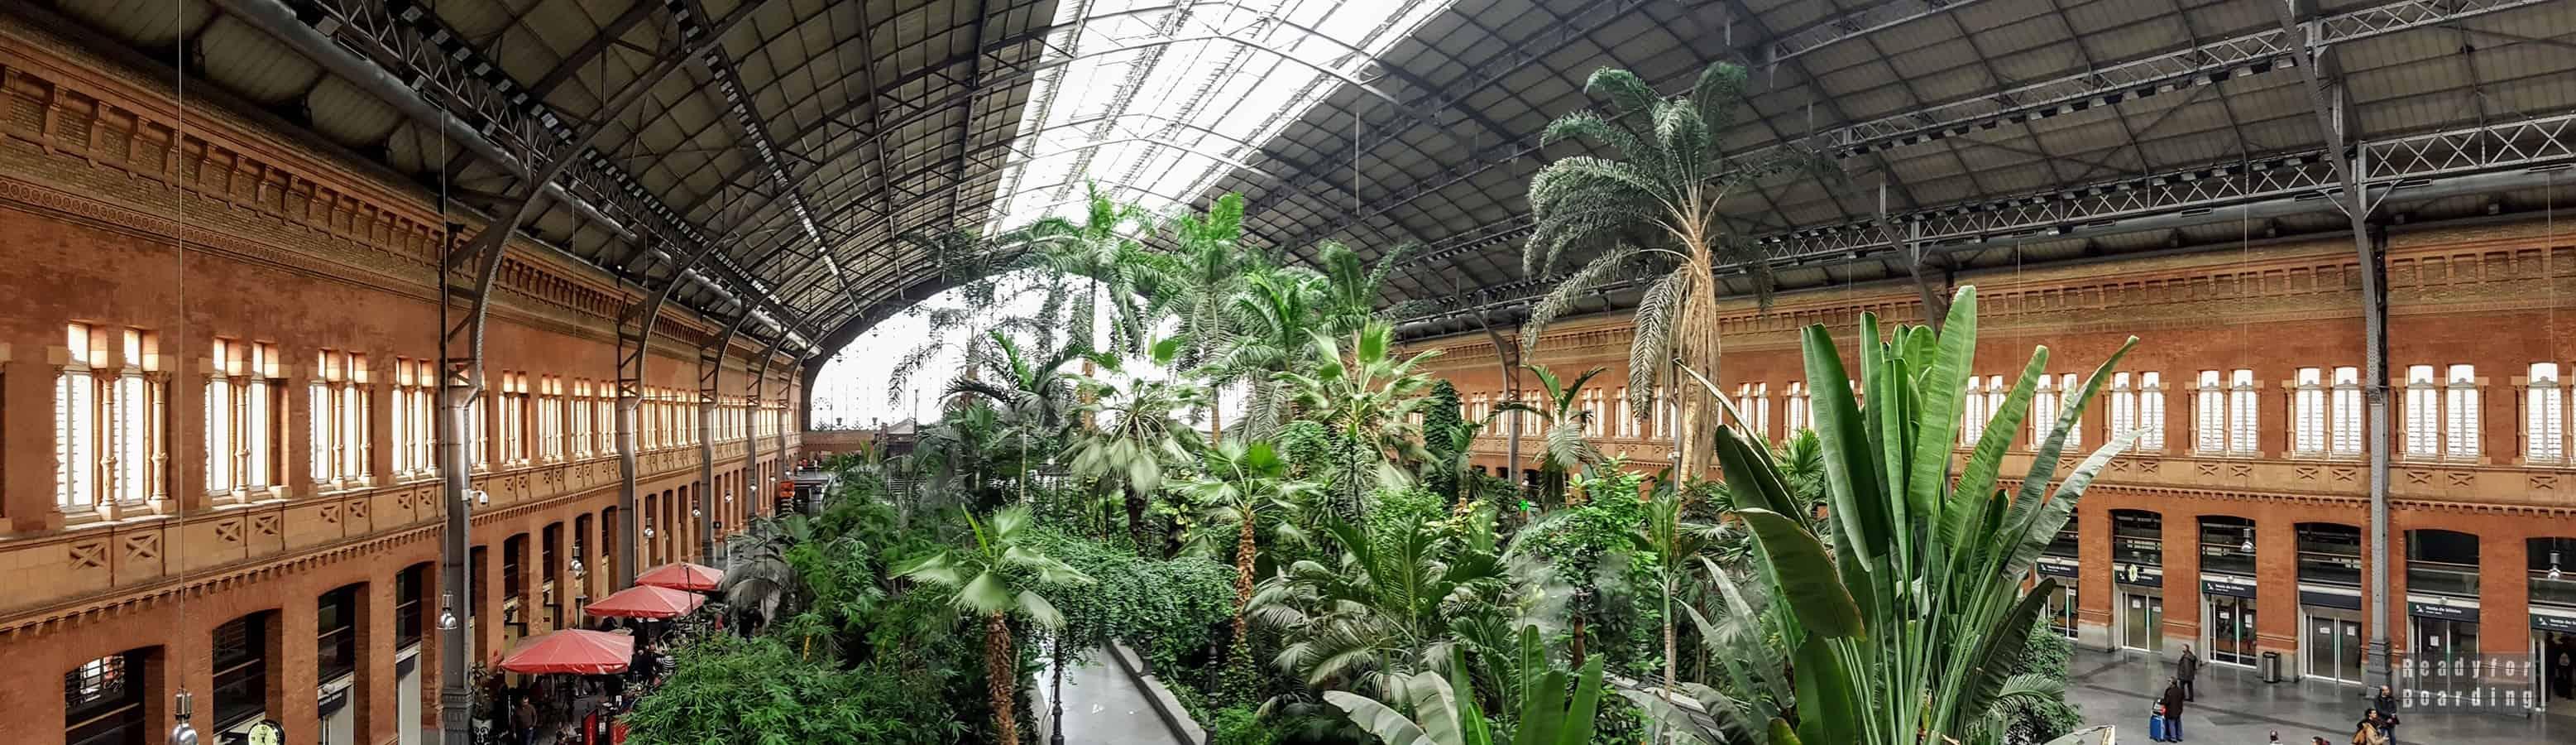 Panorama: Dworzec Madryt Atocha - Hiszpania